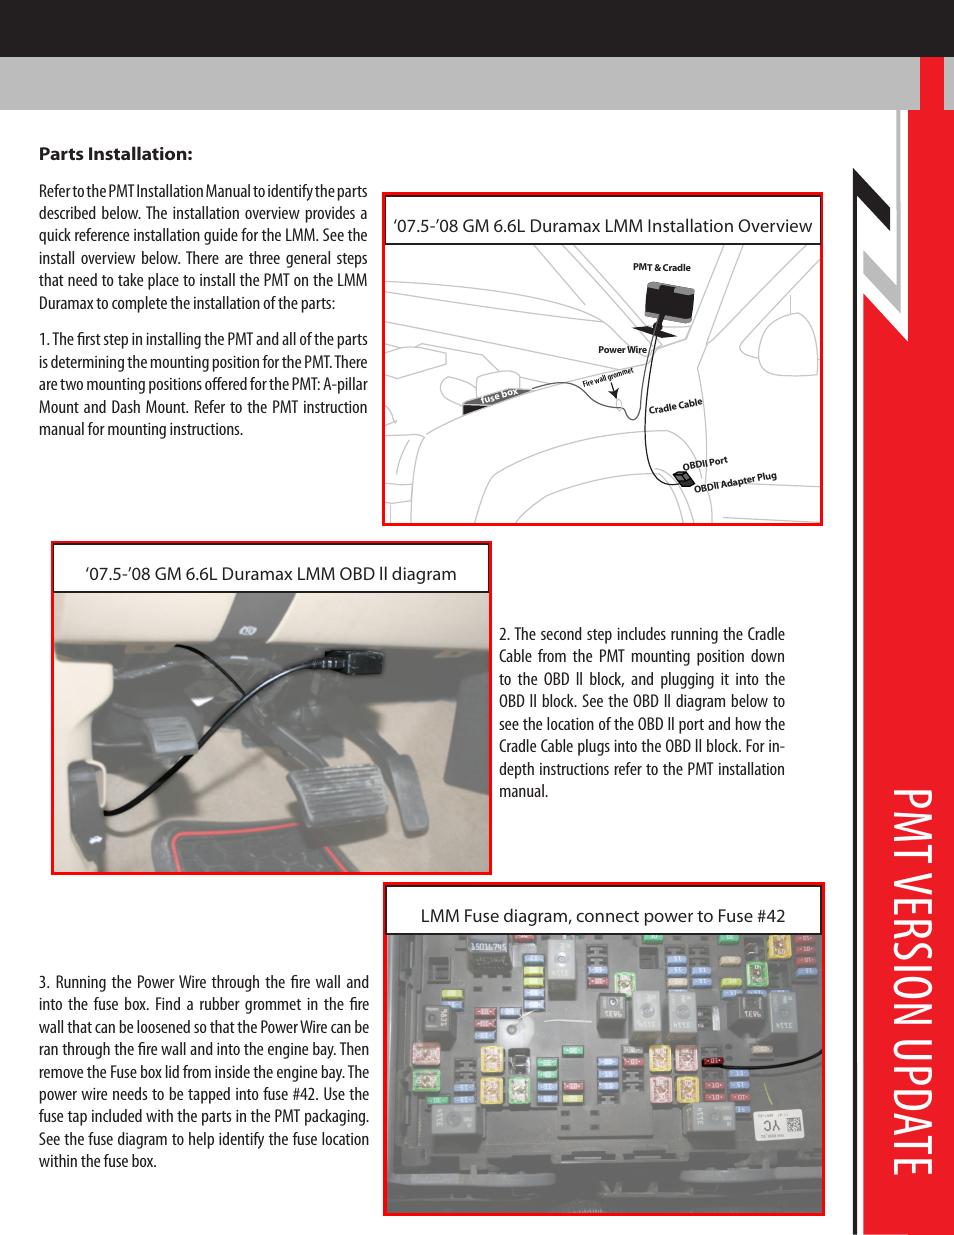 Pm t v er sio n u pda te | Bully Dog PMT 07.5-08 GM 6.6L Duramax LMM  Version 1.0.1.1 User Manual | Page 2 / 8